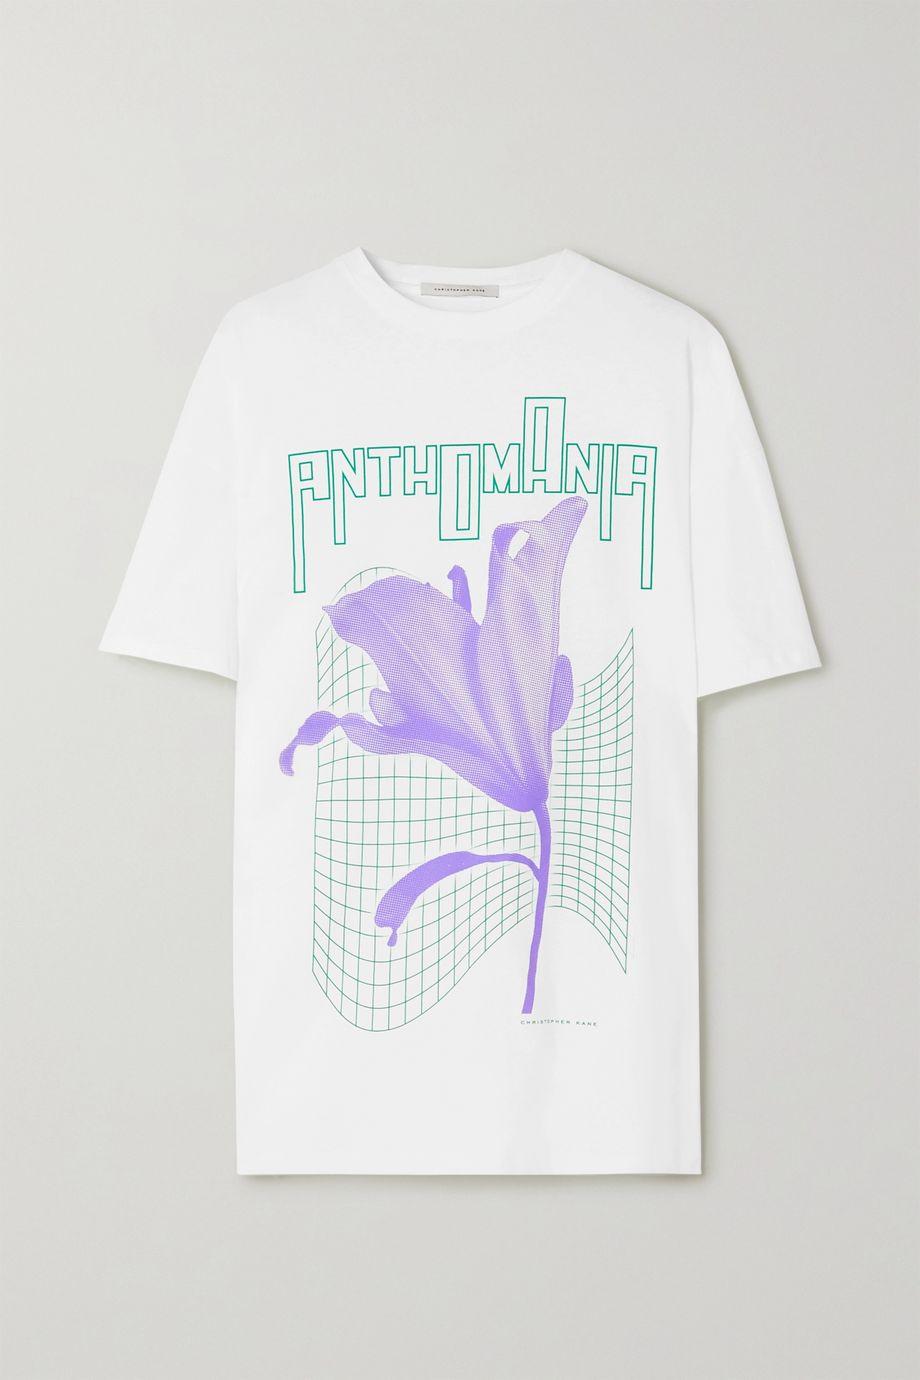 Christopher Kane Anthomania oversized printed cotton-jersey T-shirt